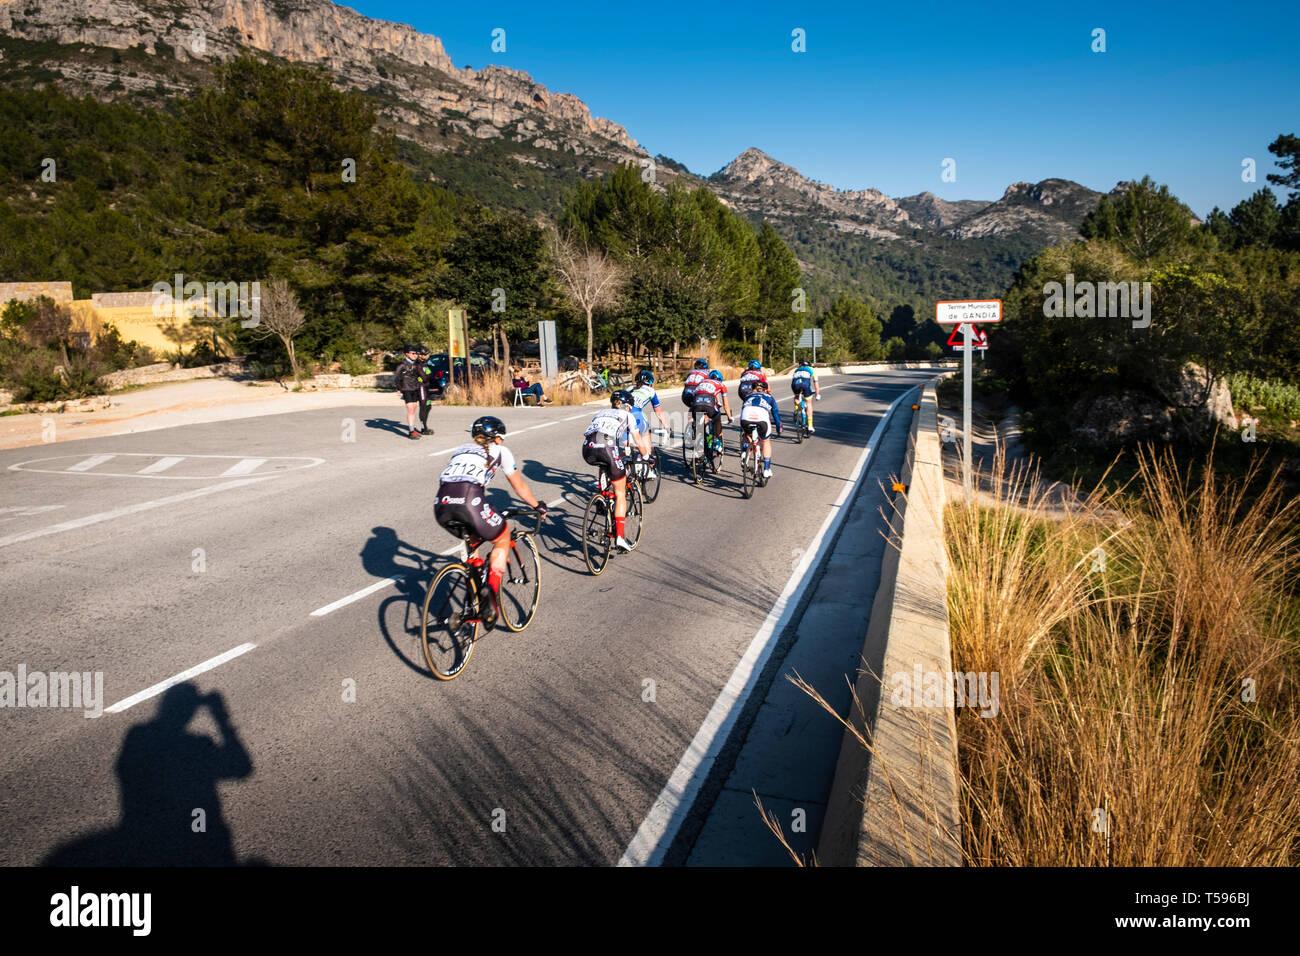 Woman's Cycle race through the La Safor mountains near Gandia Spain Stock Photo